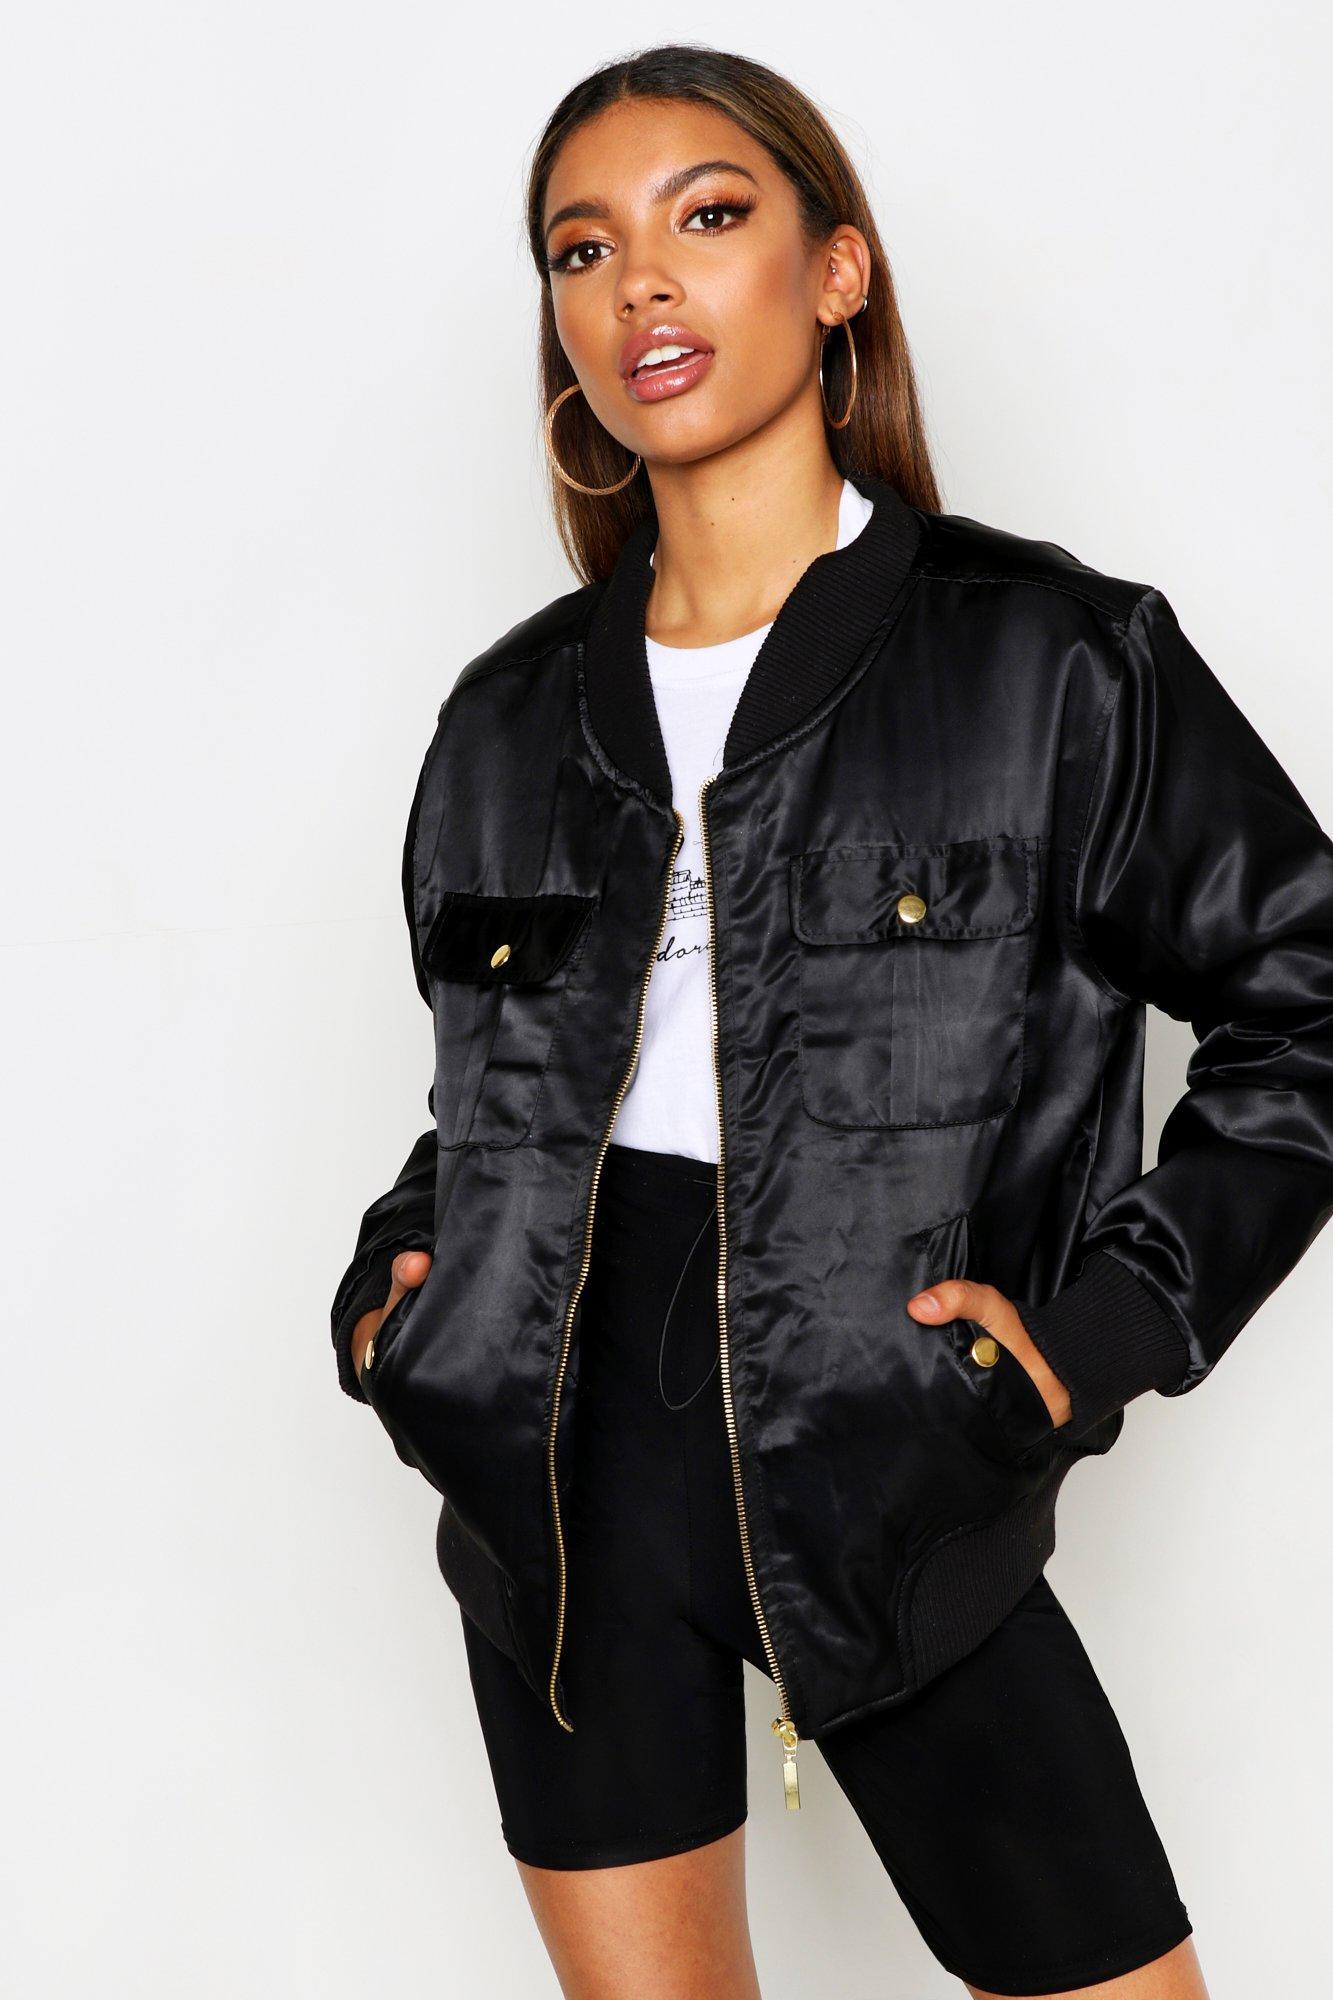 6e77e309866 asos bomber jacket with chest pocket black - Shop asos bomber jacket ...